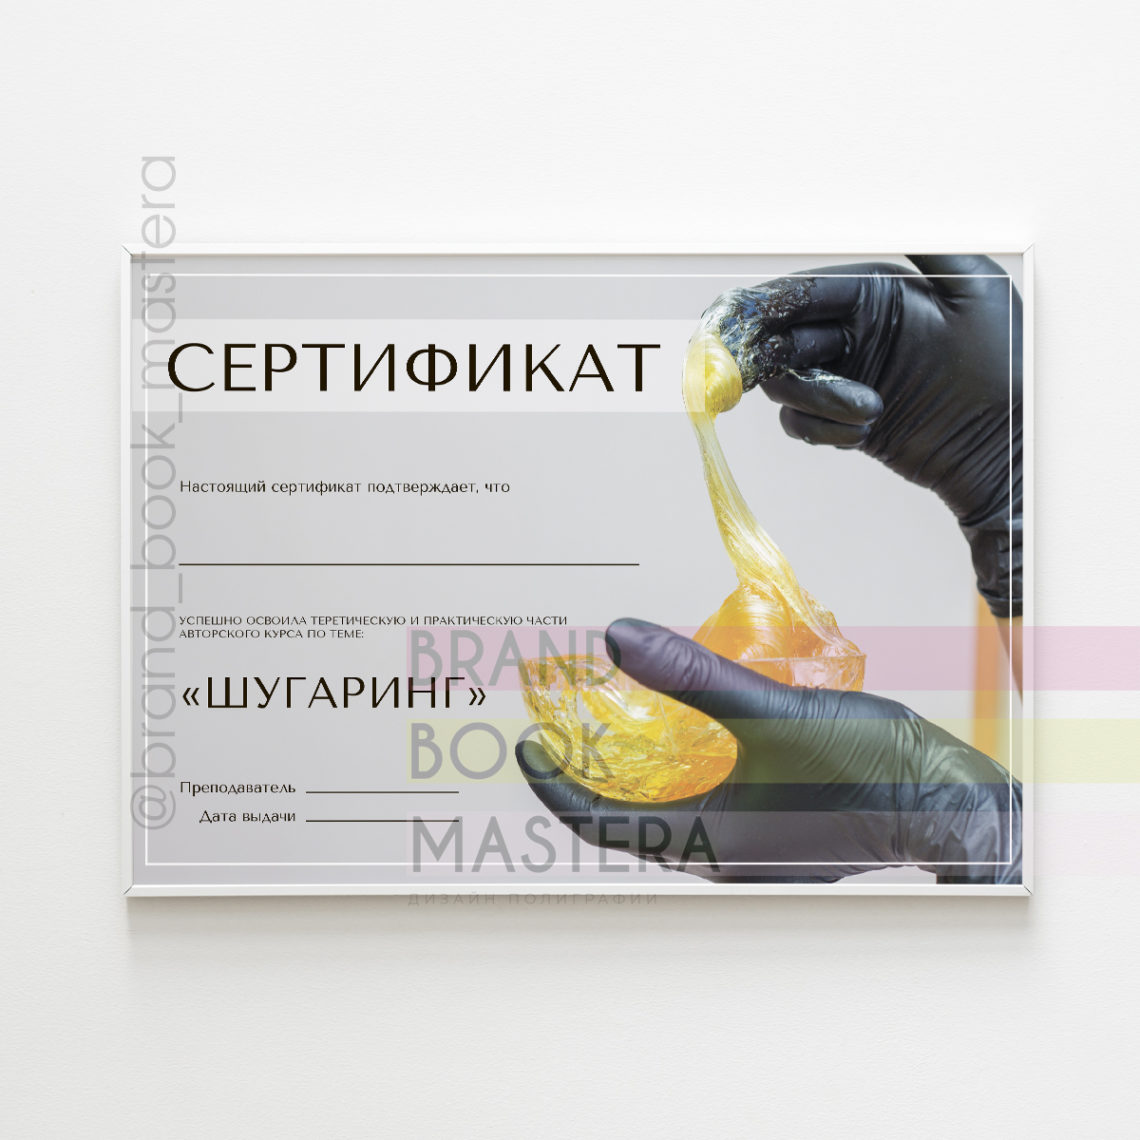 сертификат об обучении шугаринг